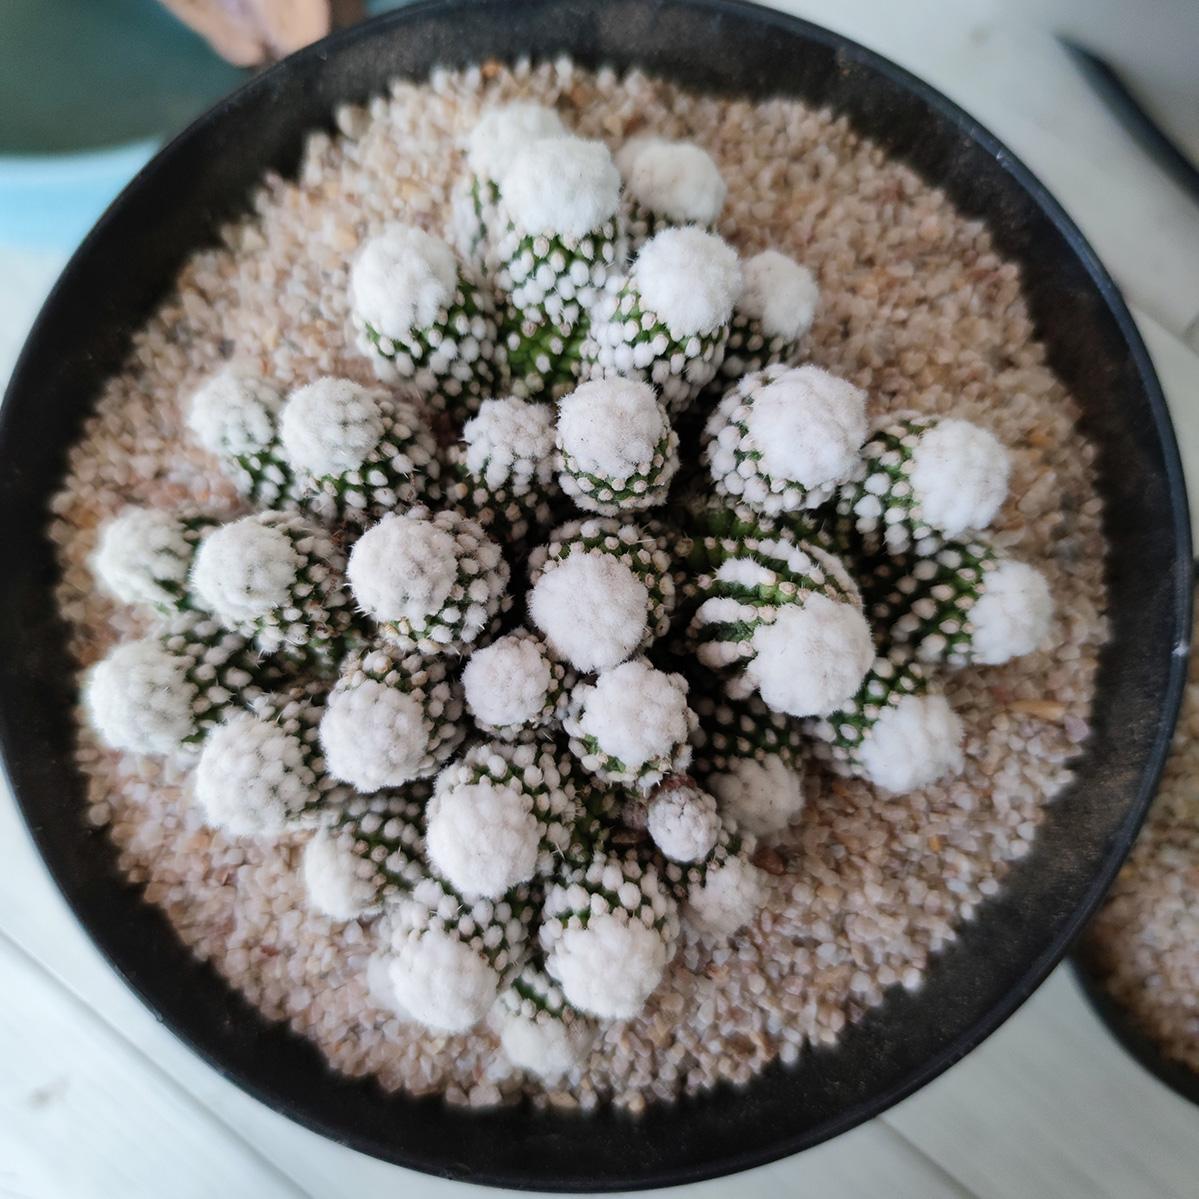 雪顶明日香姬Mammillaria vetula subs. gracilis cv. Arizona Snowcap